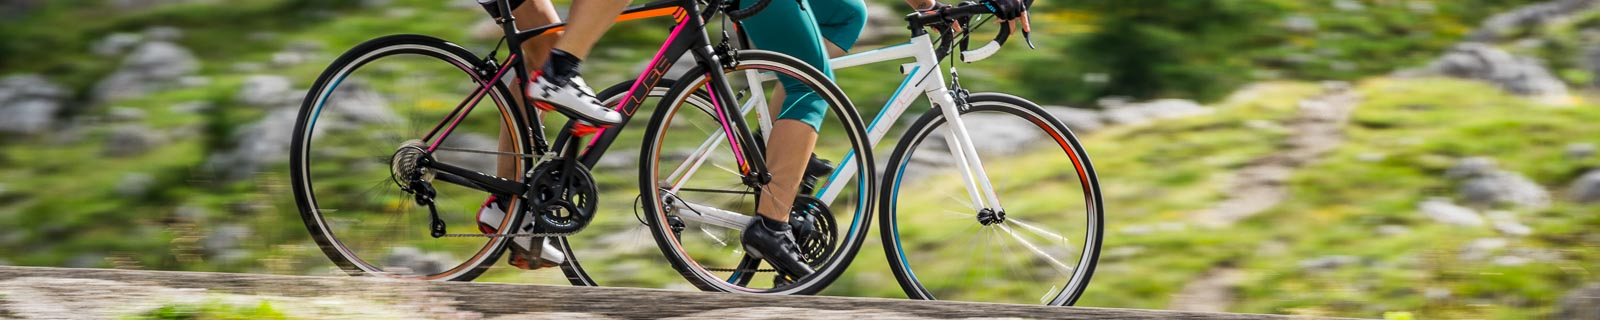 Vélos de course femmes